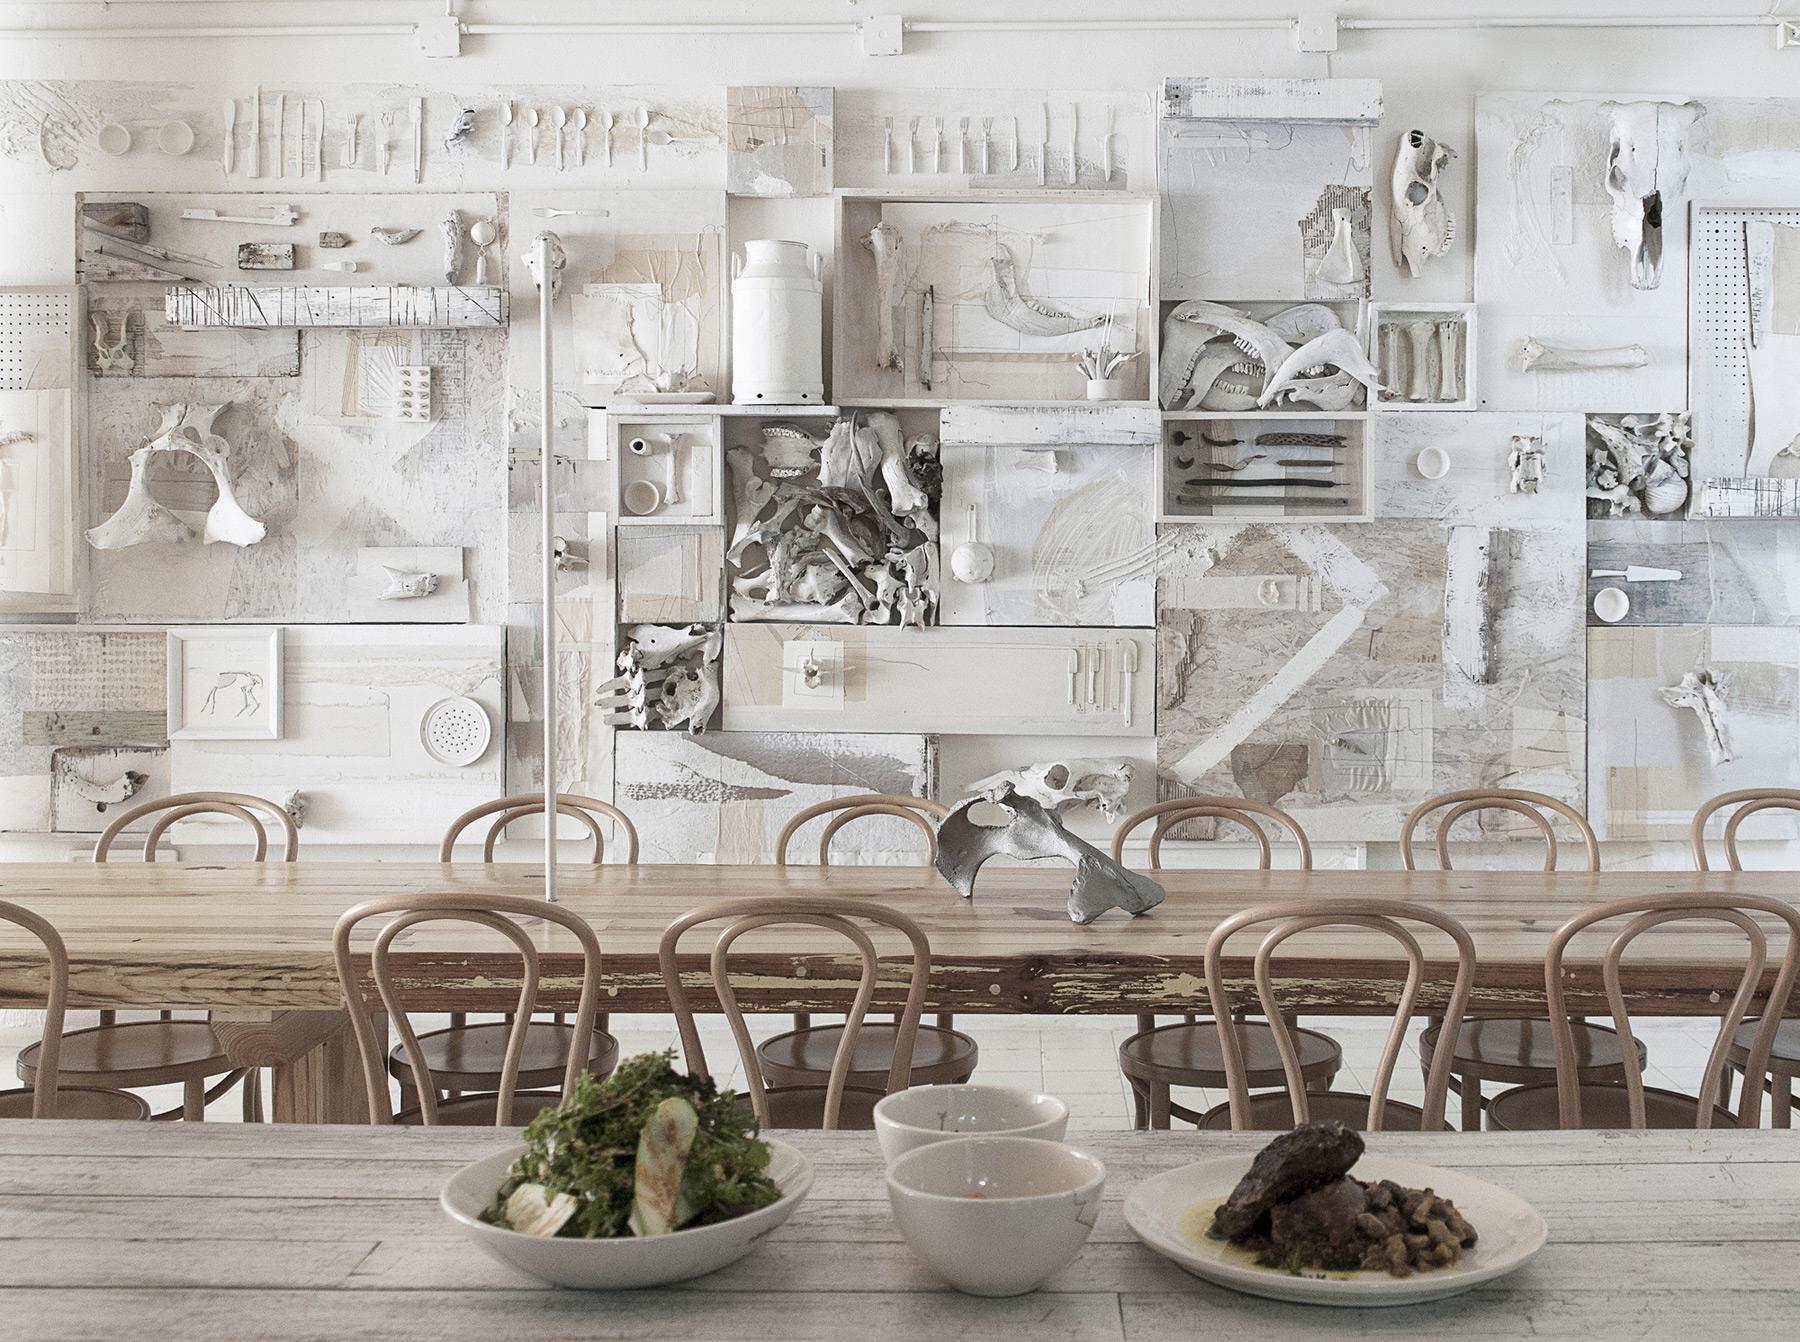 Hueso Restaurant / Cadena Asociados (21)